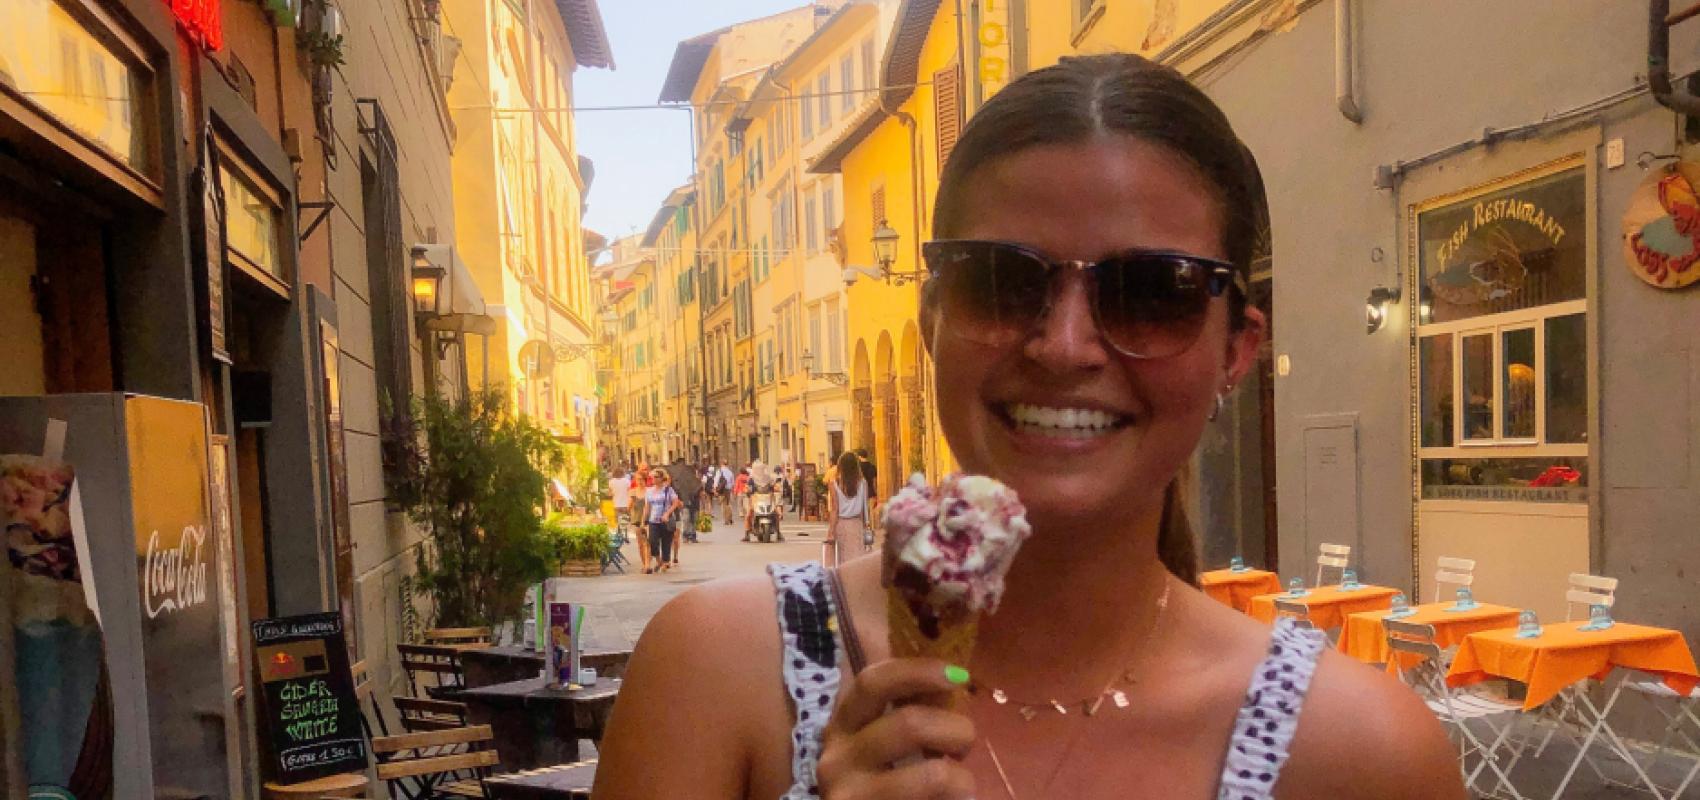 Student enjoying gelato in Italian street